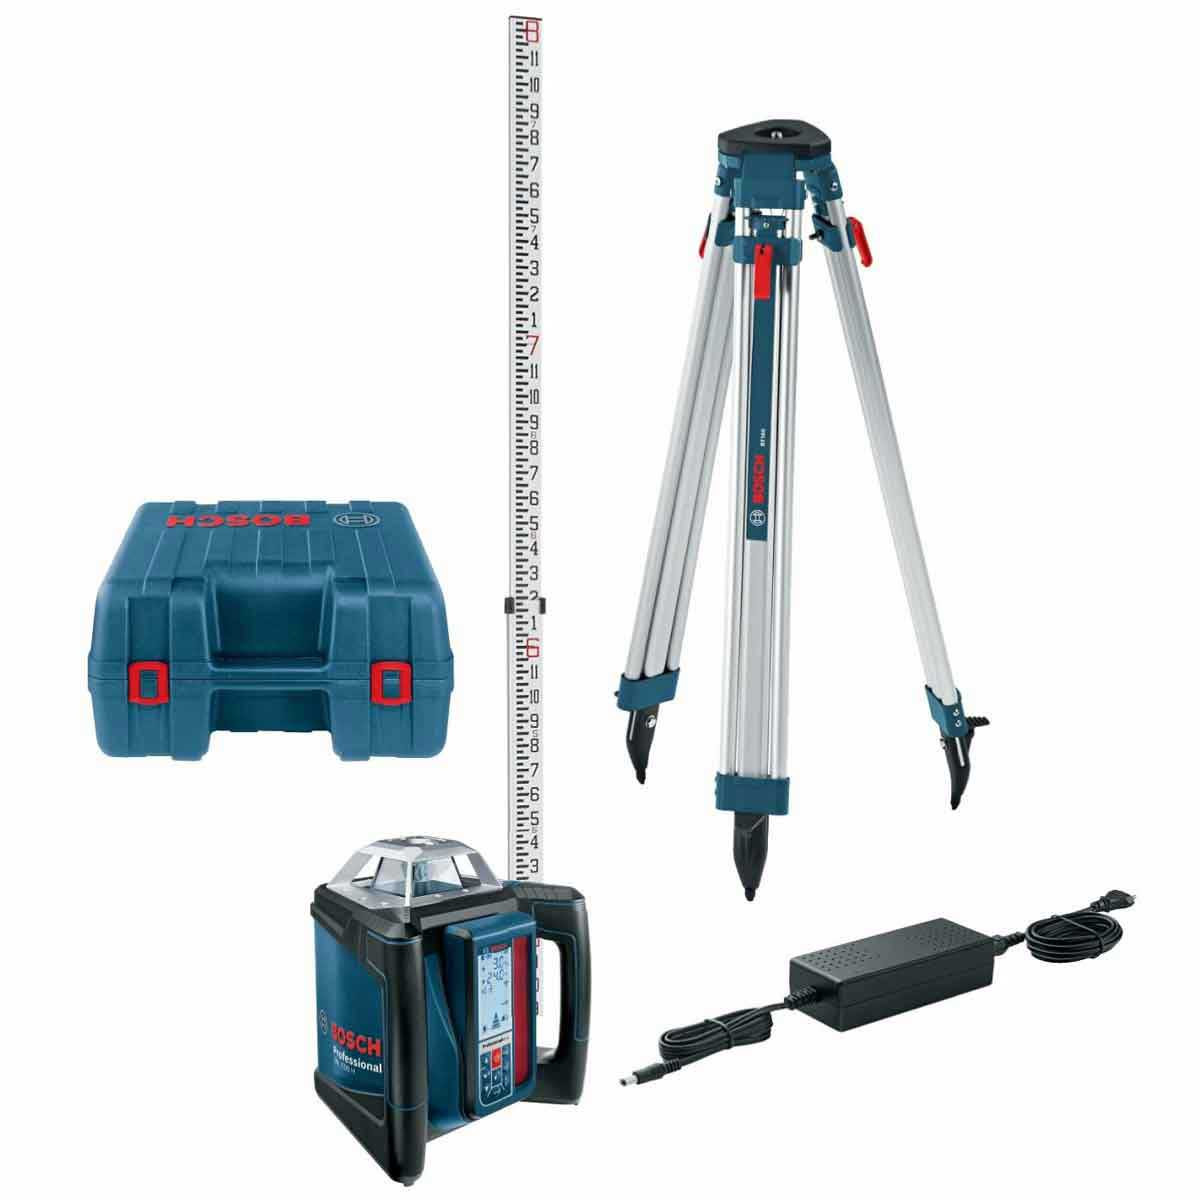 Bosch Self-Leveling Rotary Laser Kit GRL500HCK